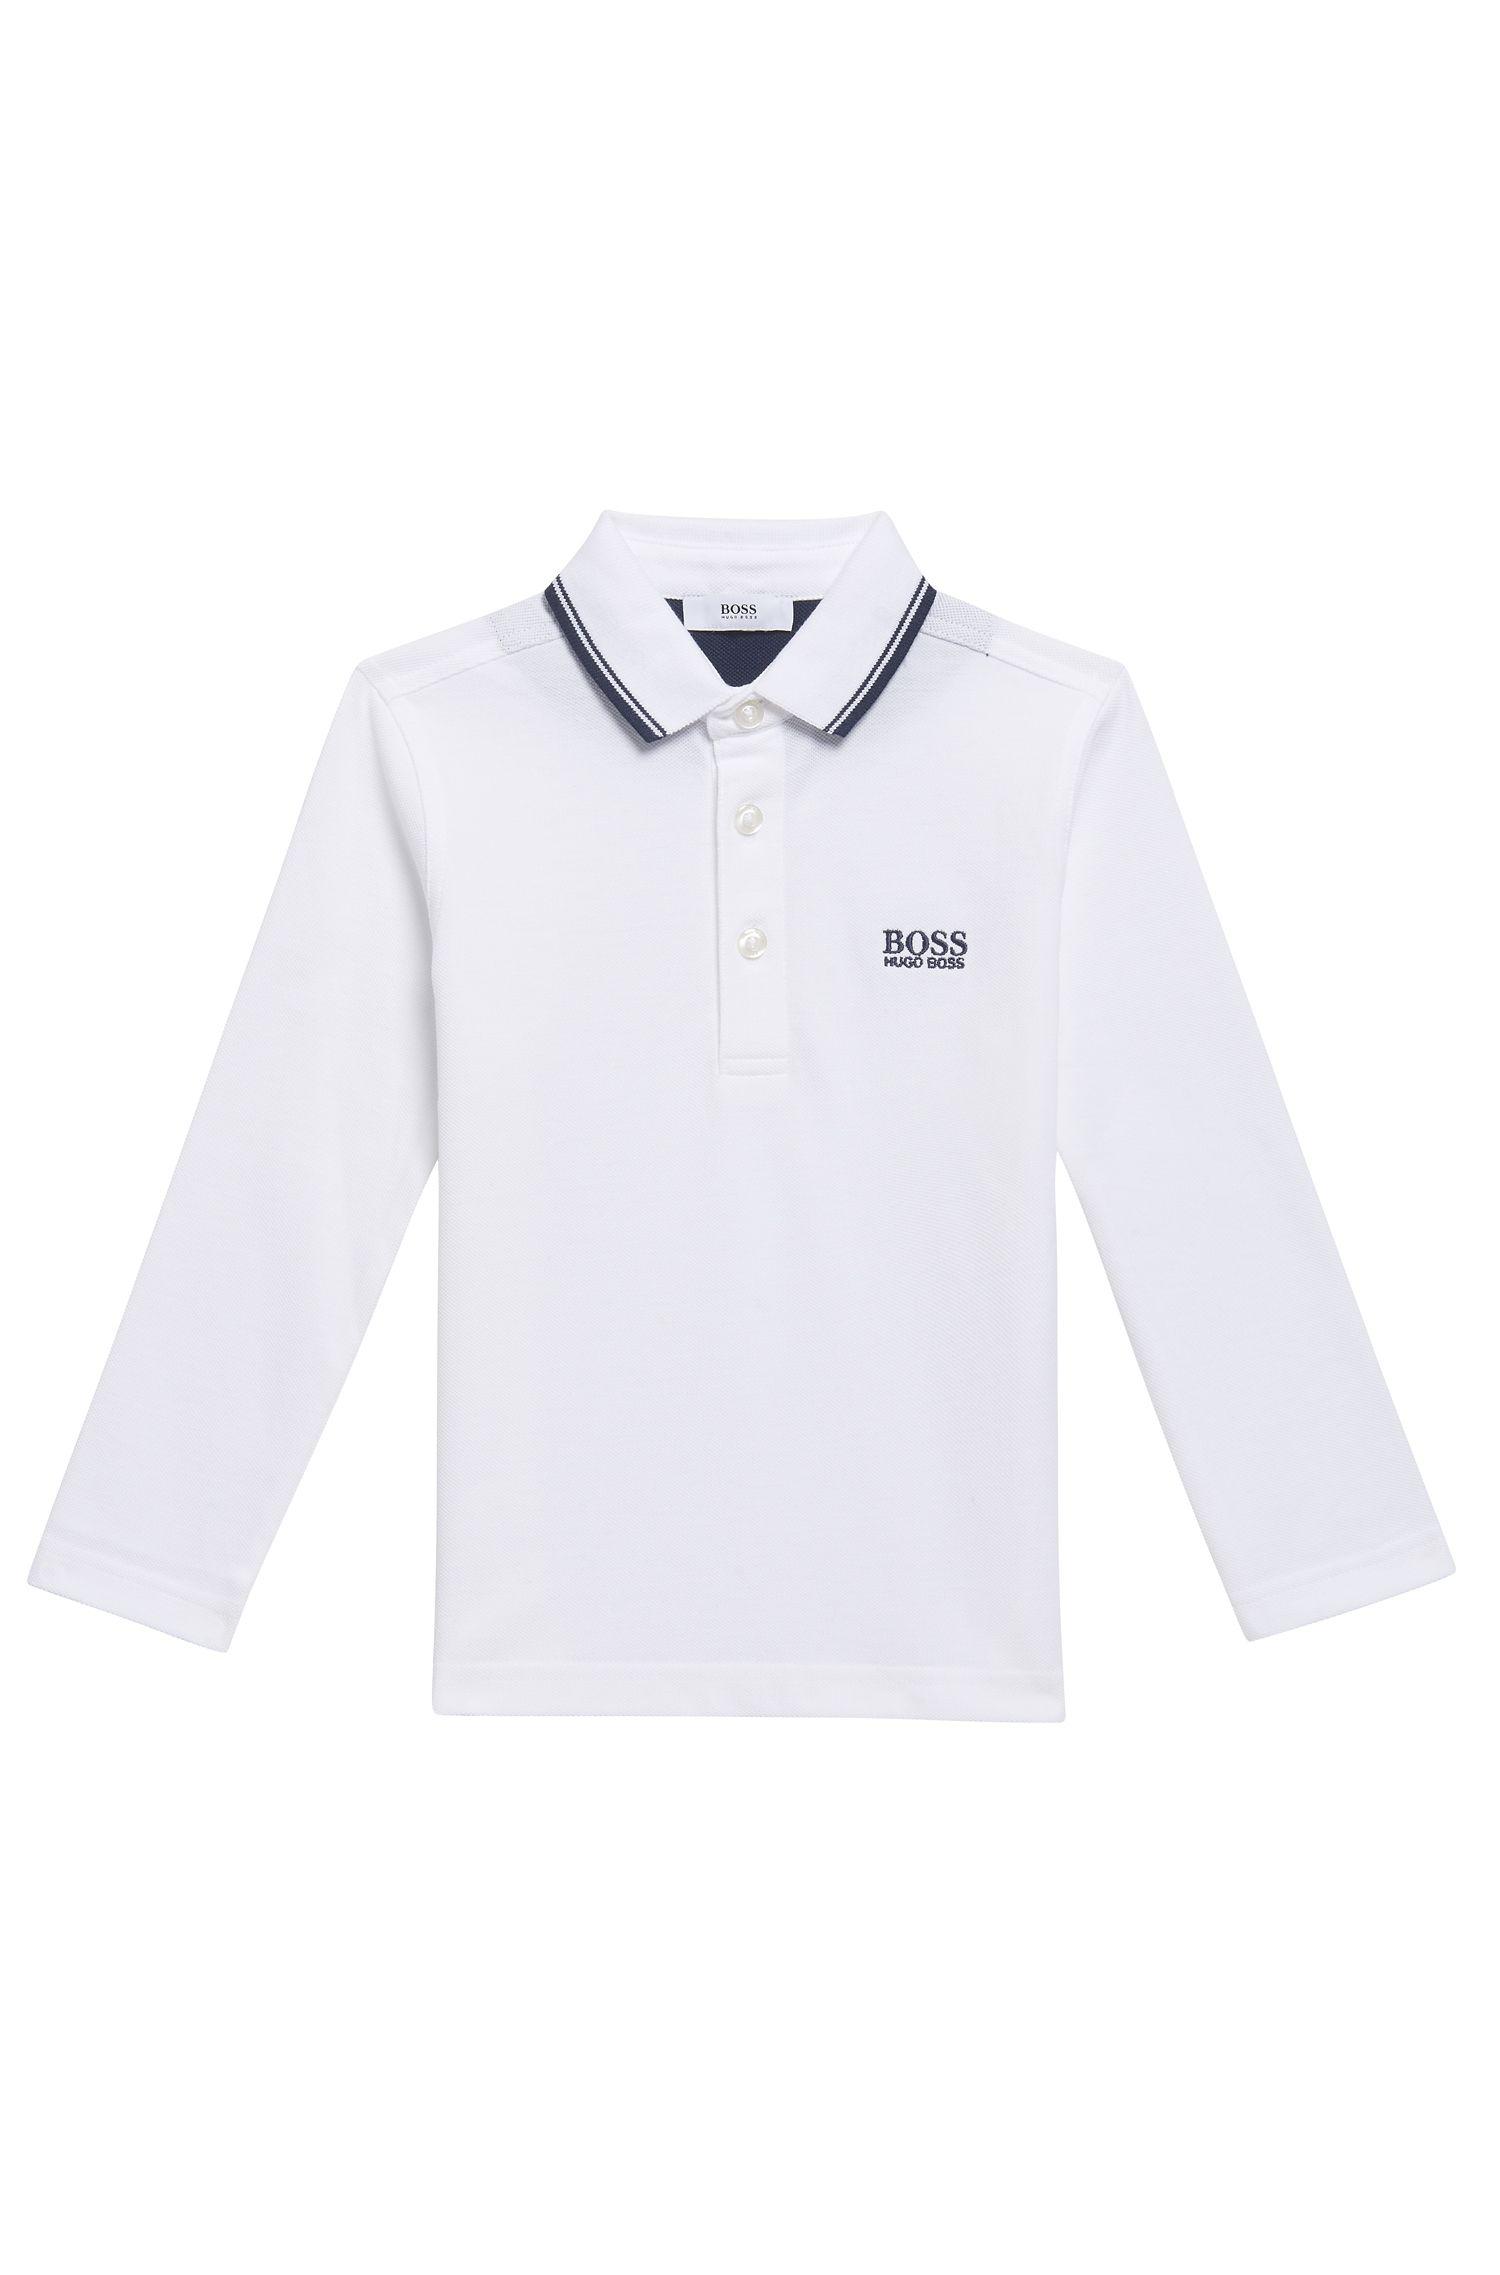 'J25V24' | Boys Cotton Polo Shirt